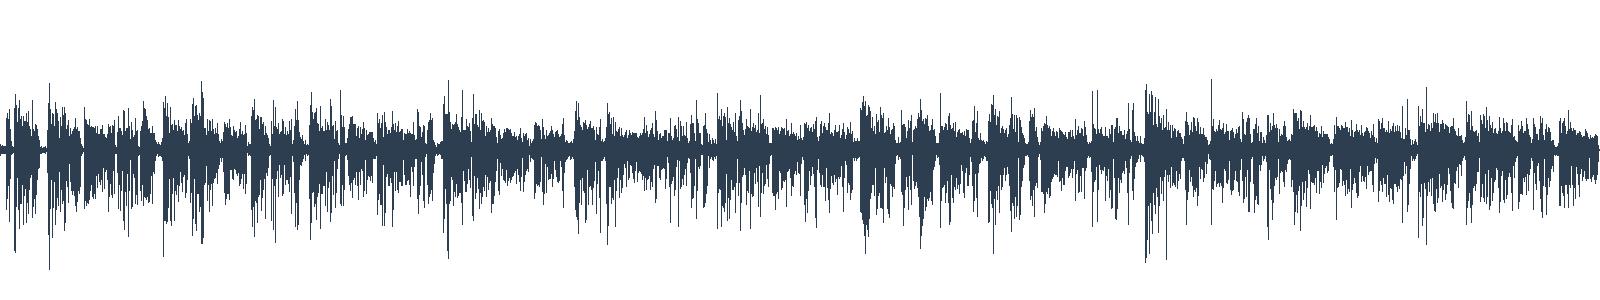 Nové audioknihy 22/2019 waveform